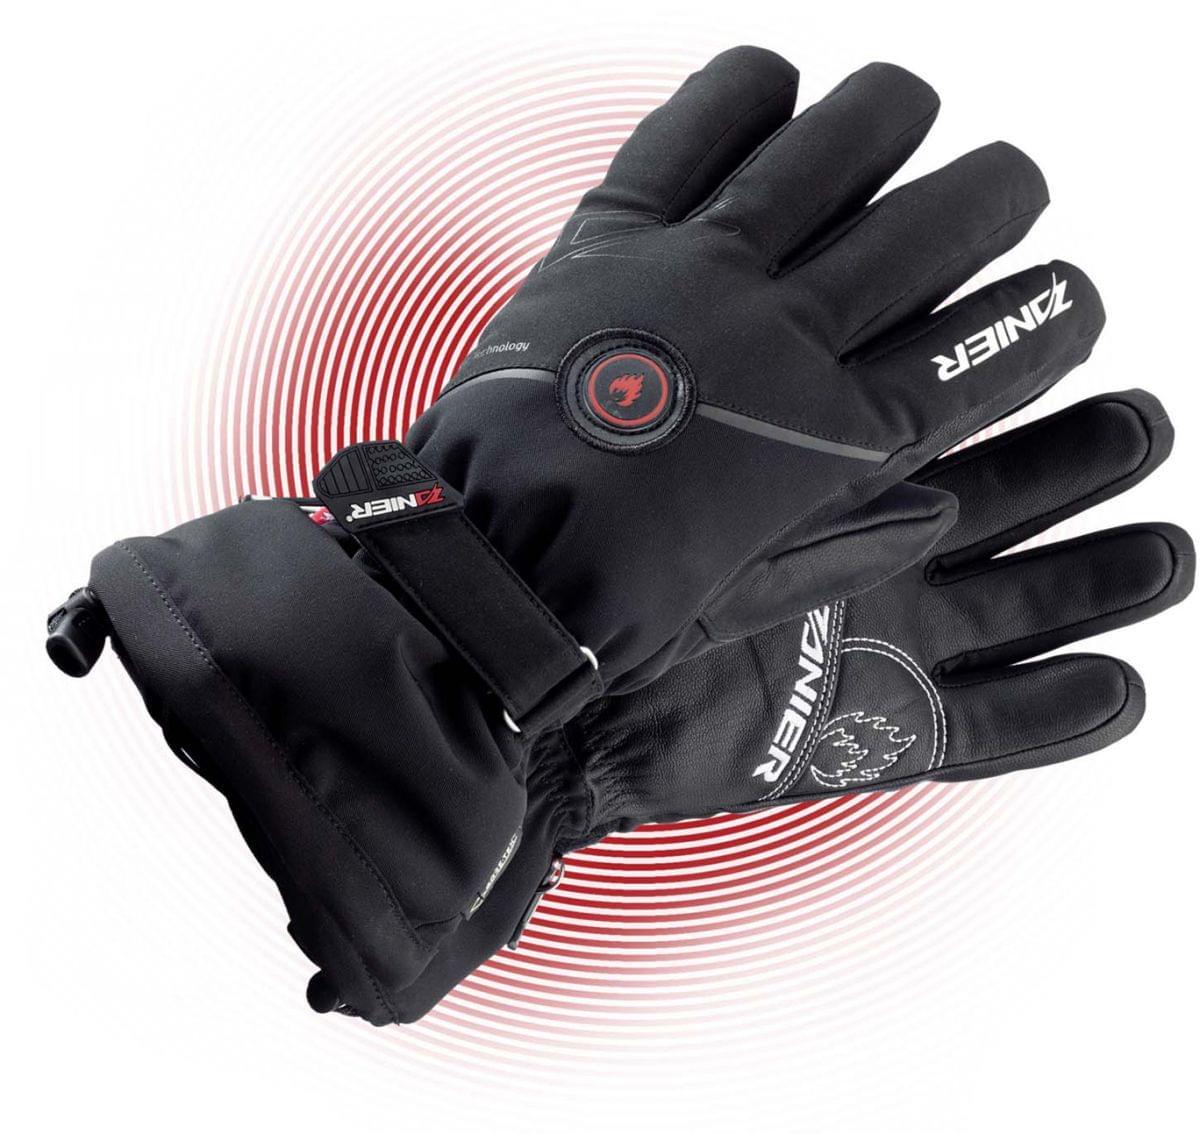 Vyhřívané rukavice Zanier Heat GTX 2.0 - black - Ski a Bike Centrum ... 05b46f2fb6